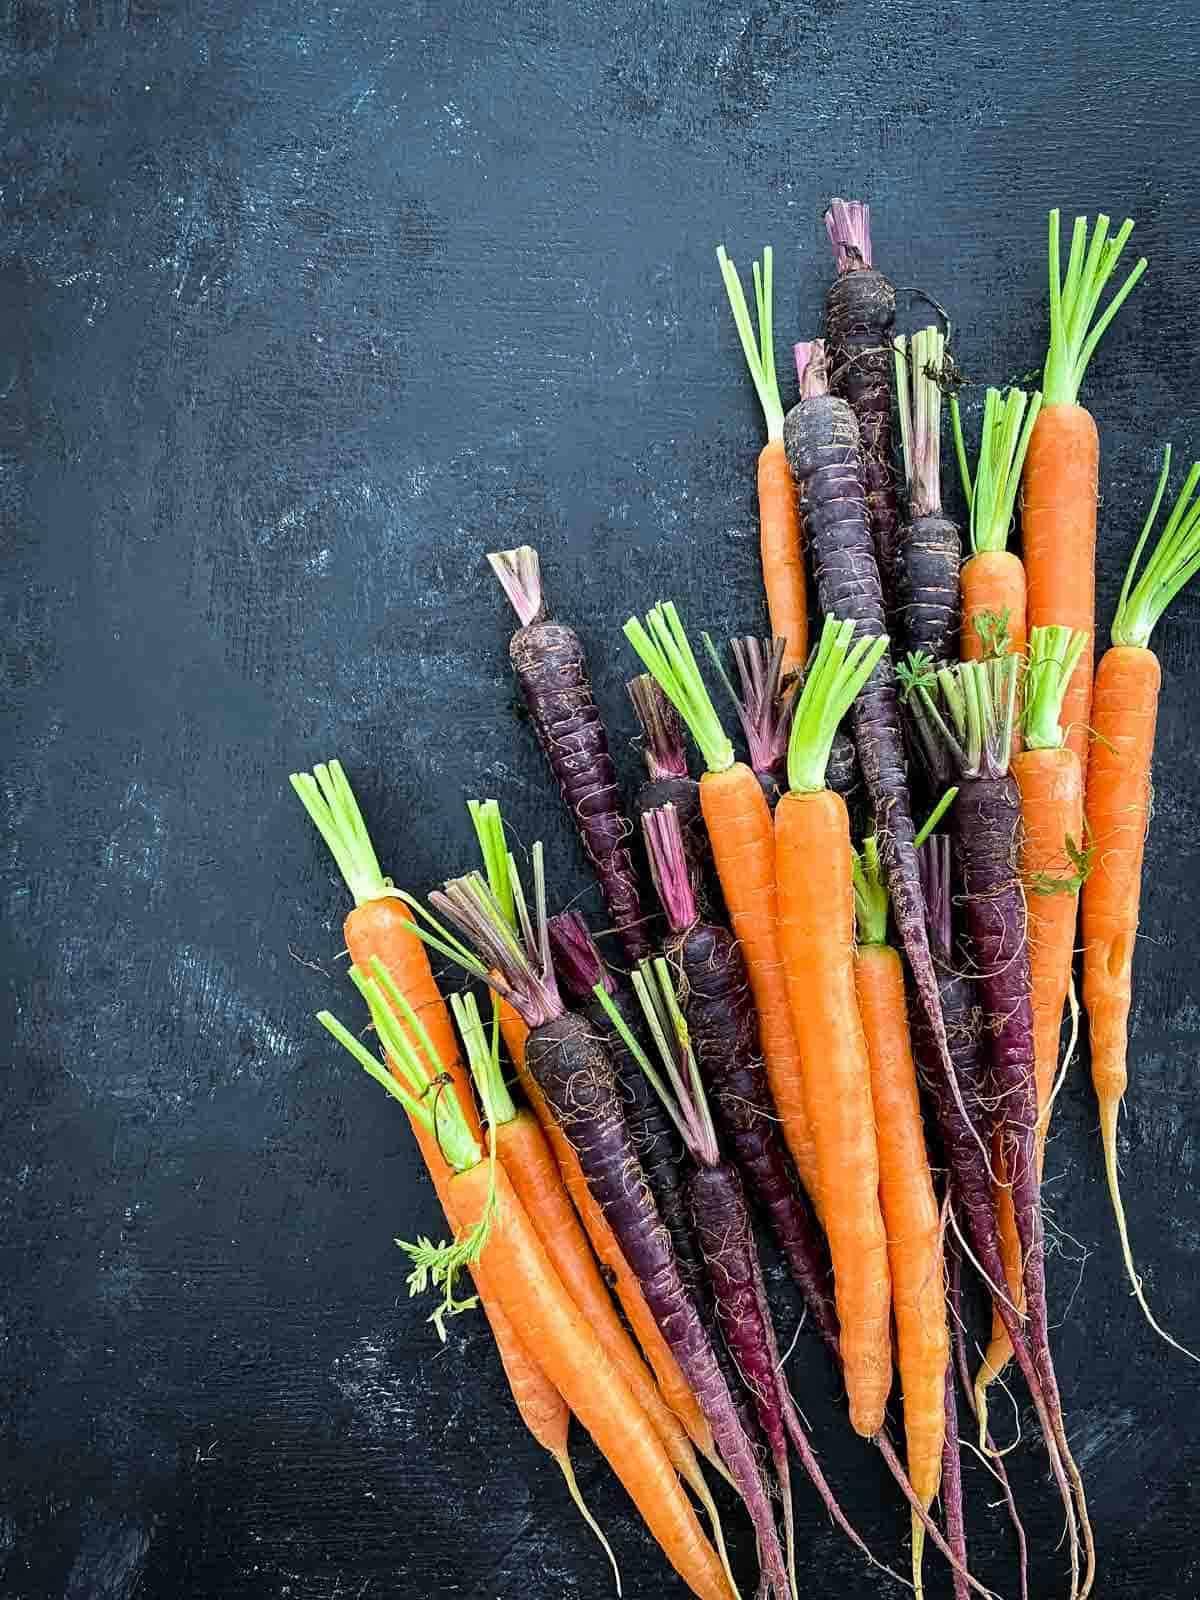 Purple and orange Dutch carrots